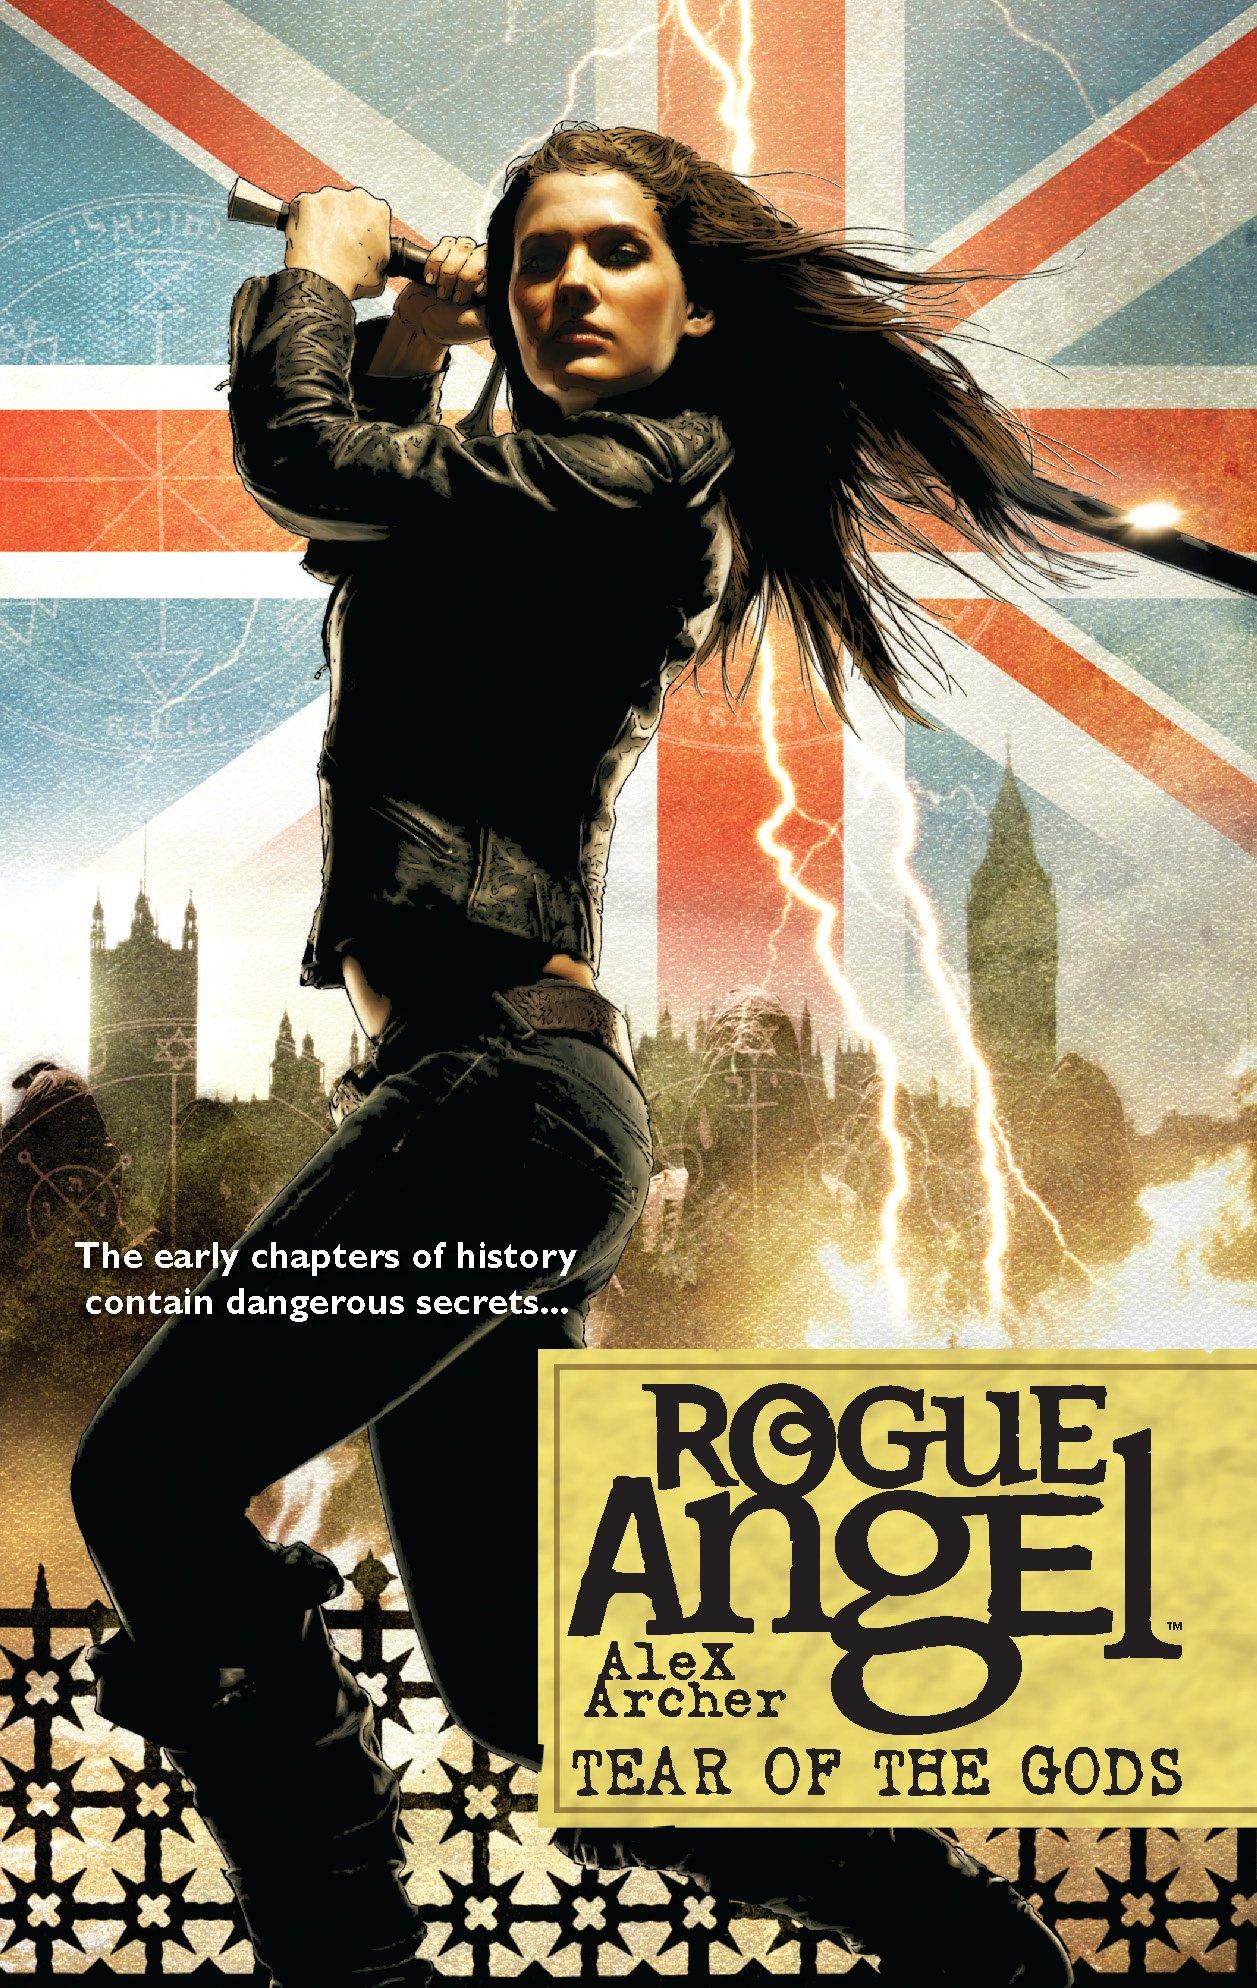 Amazon.com: Tear of the Gods (Rogue Angel) (9780373621507): Alex Archer:  Books